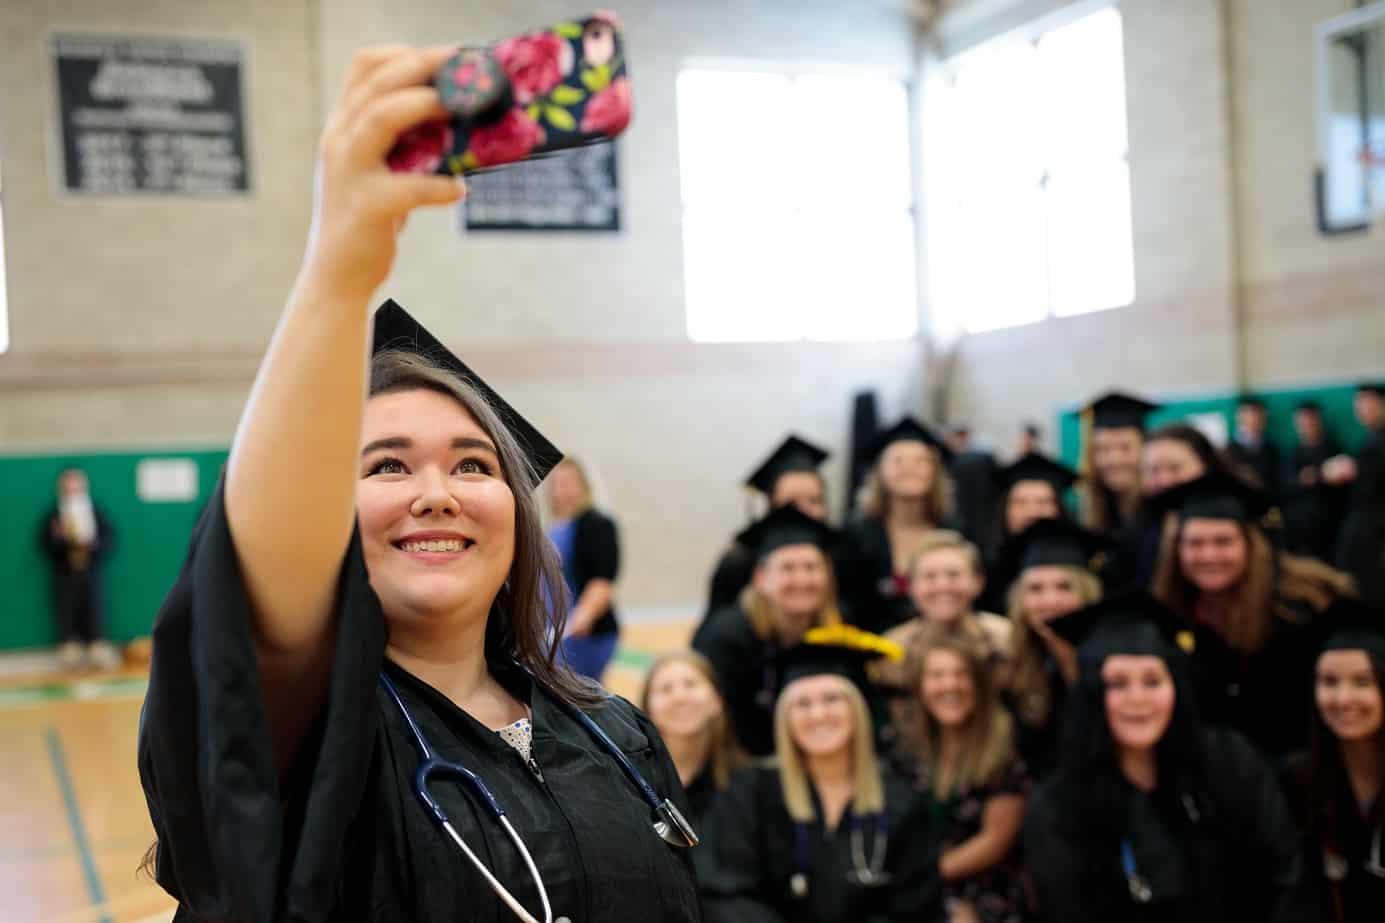 Nursing students, female, posing for group selfie, commencement, graduation